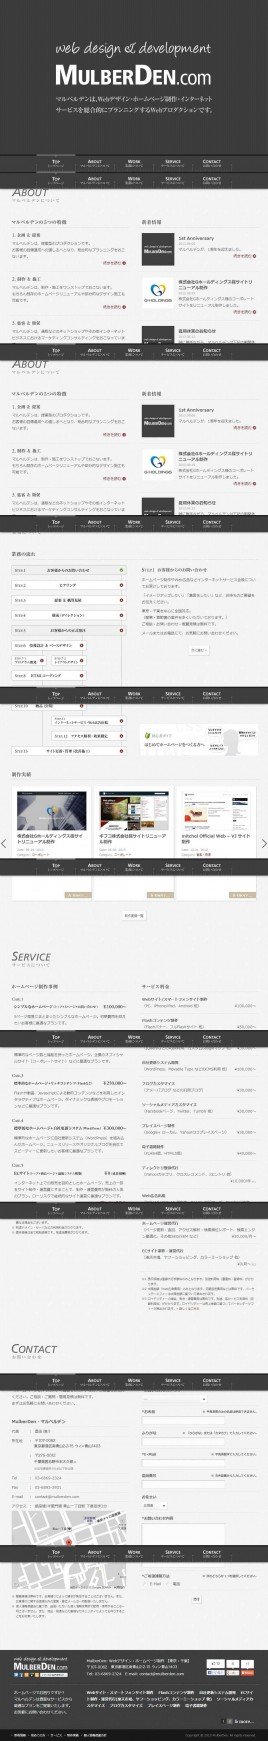 MulberDen- Webデザイン・ホームページ制作 【東京・千葉】